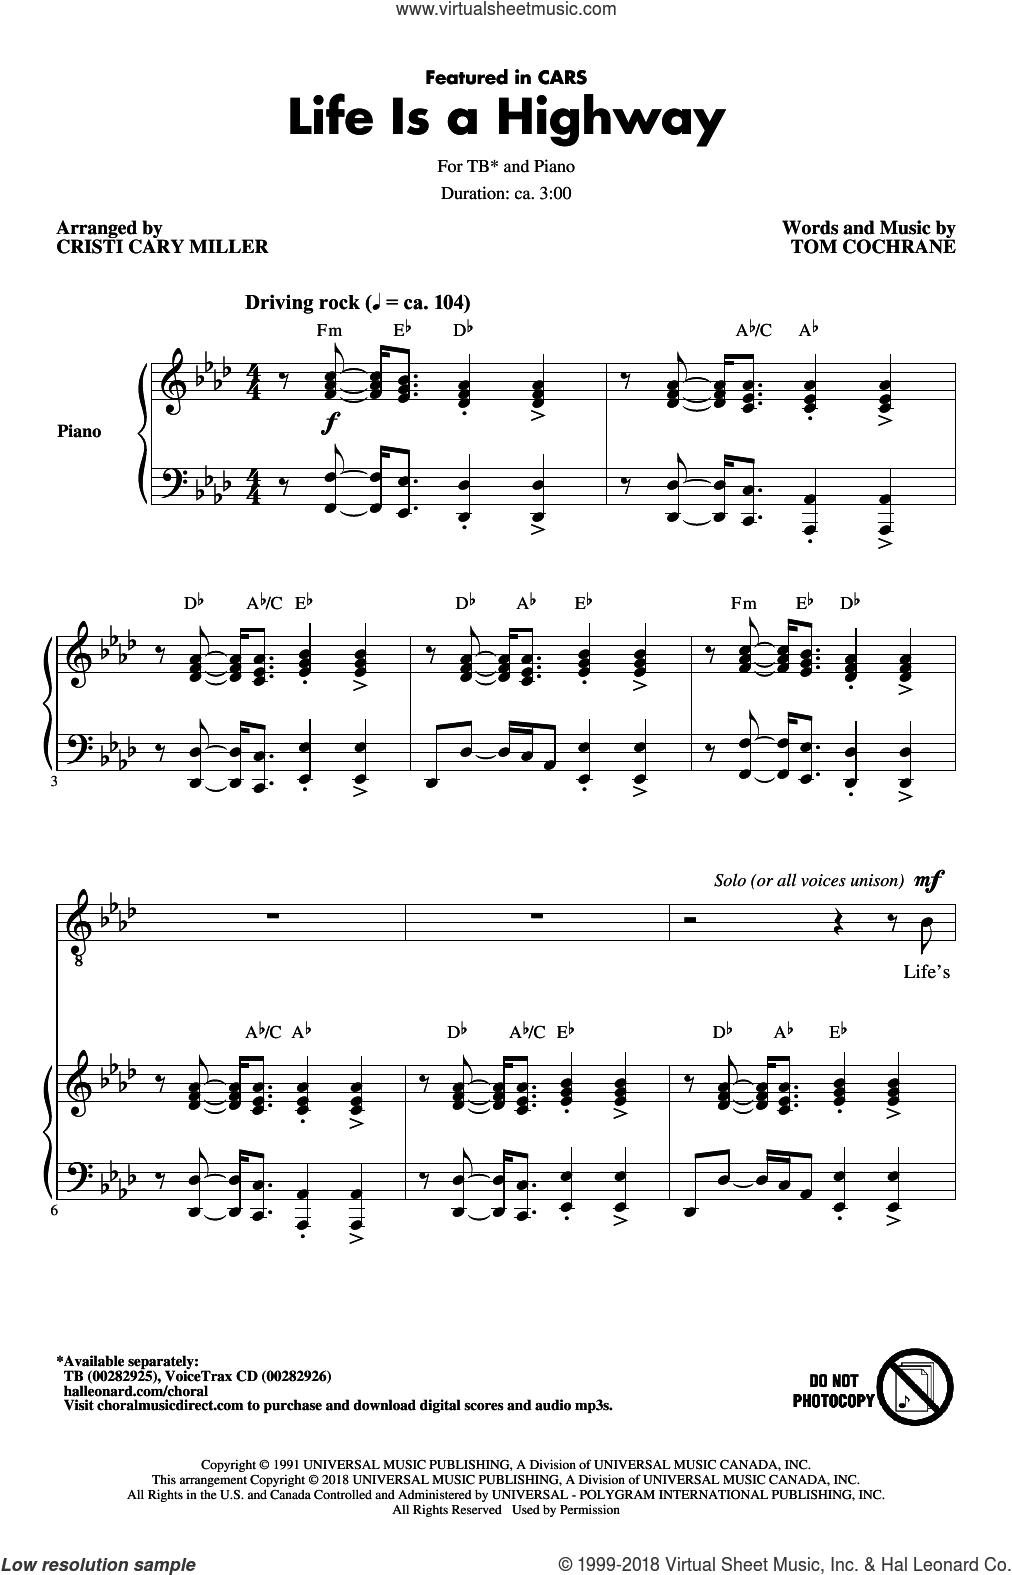 Life Is A Highway (arr. Cristy Cari Miller) sheet music for choir (TB: tenor, bass) by Tom Cochrane, Cristi Cary Miller and Rascal Flatts, intermediate skill level